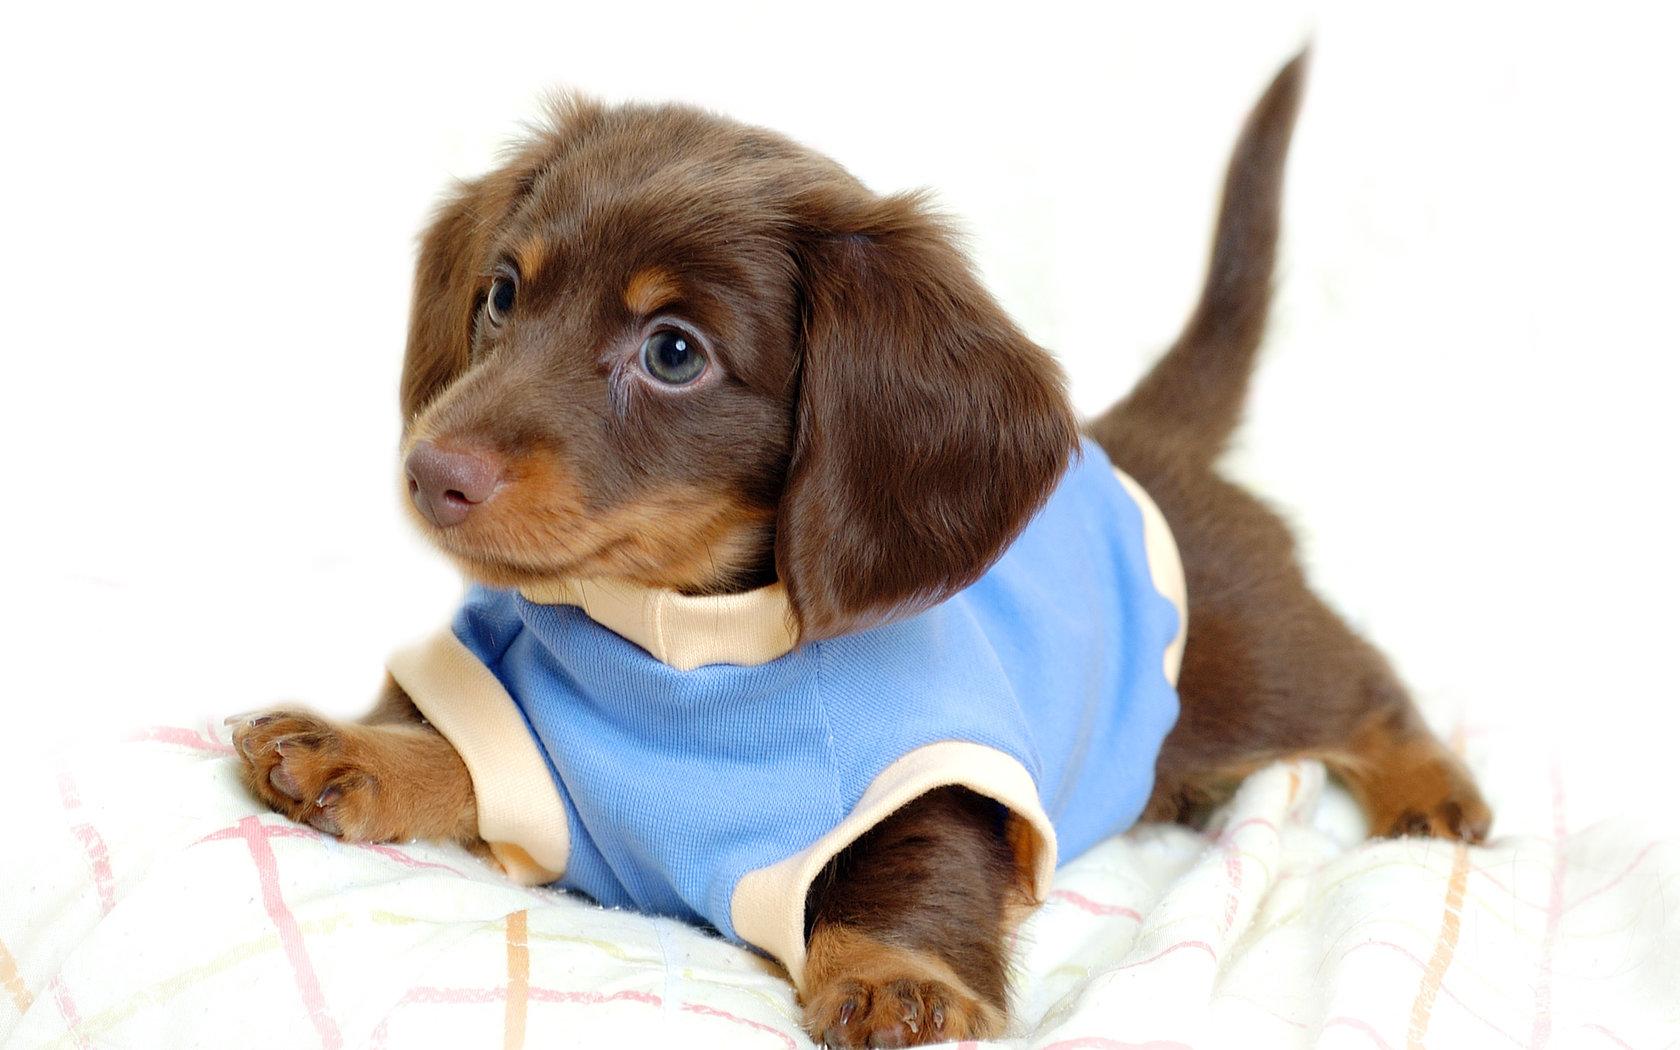 Funny puppy Desktop wallpapers 1680x1050 1680x1050